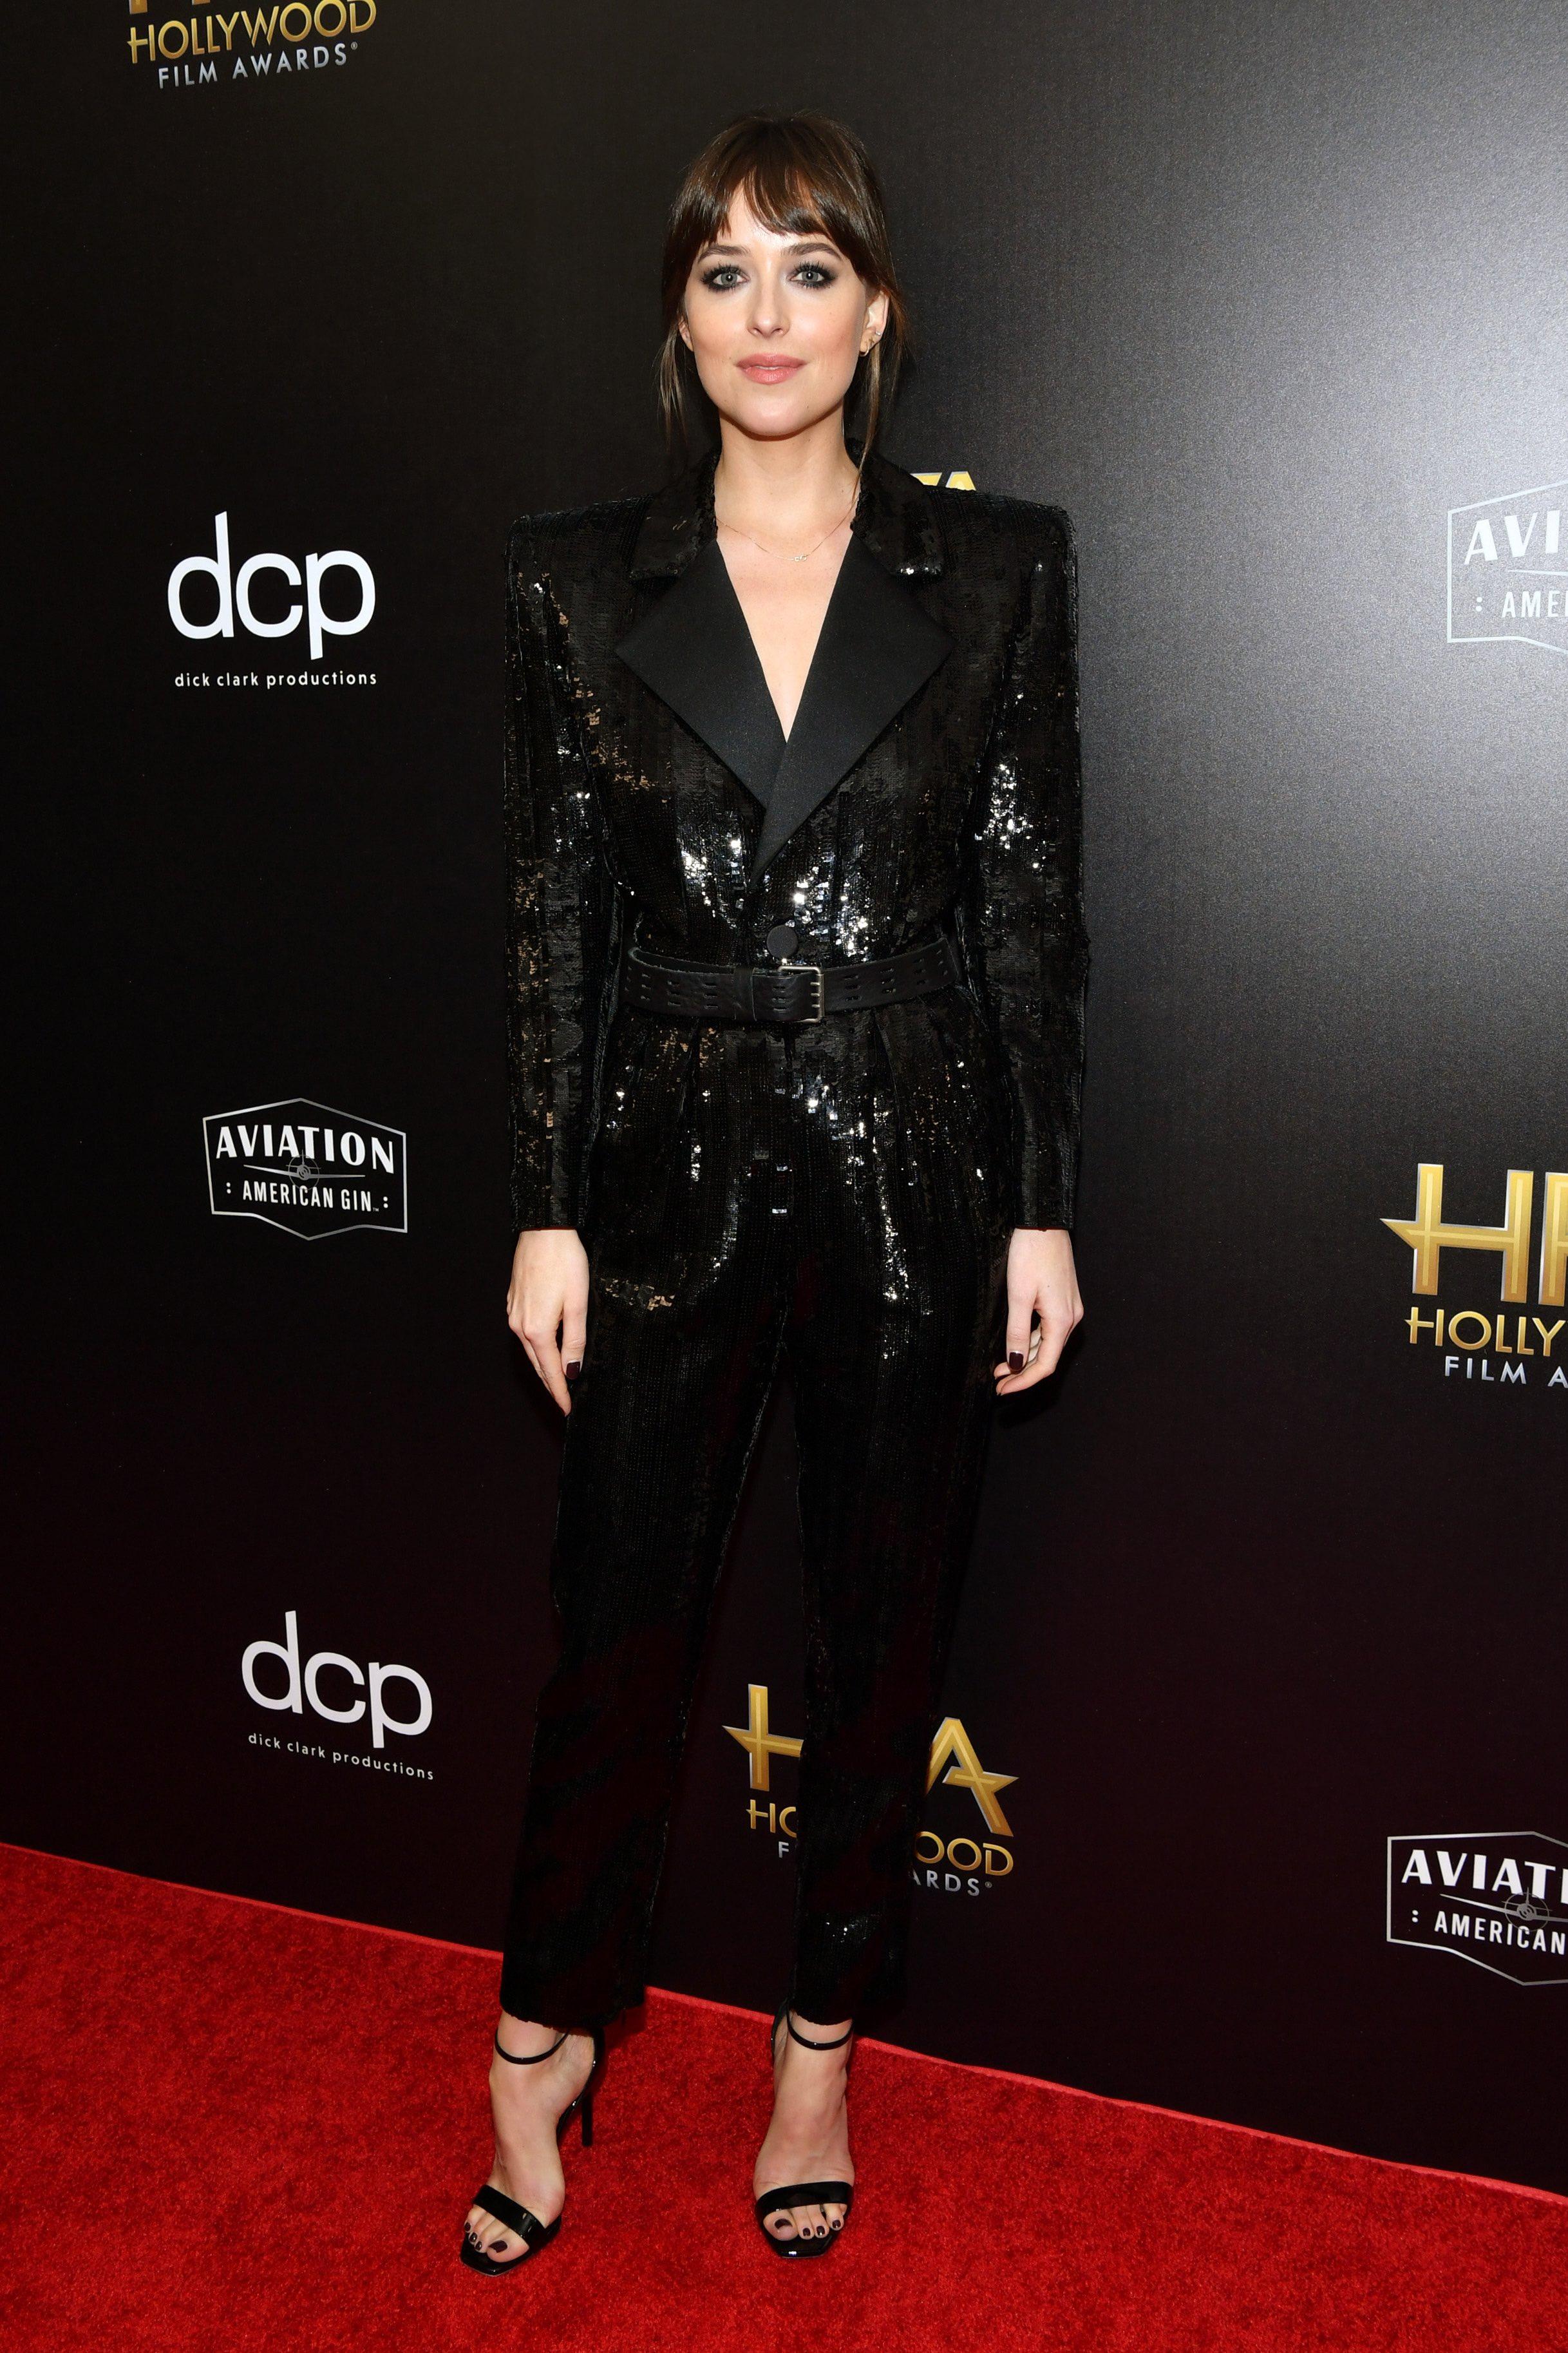 Dakota Johnson wearing Saint Laurent - About Her